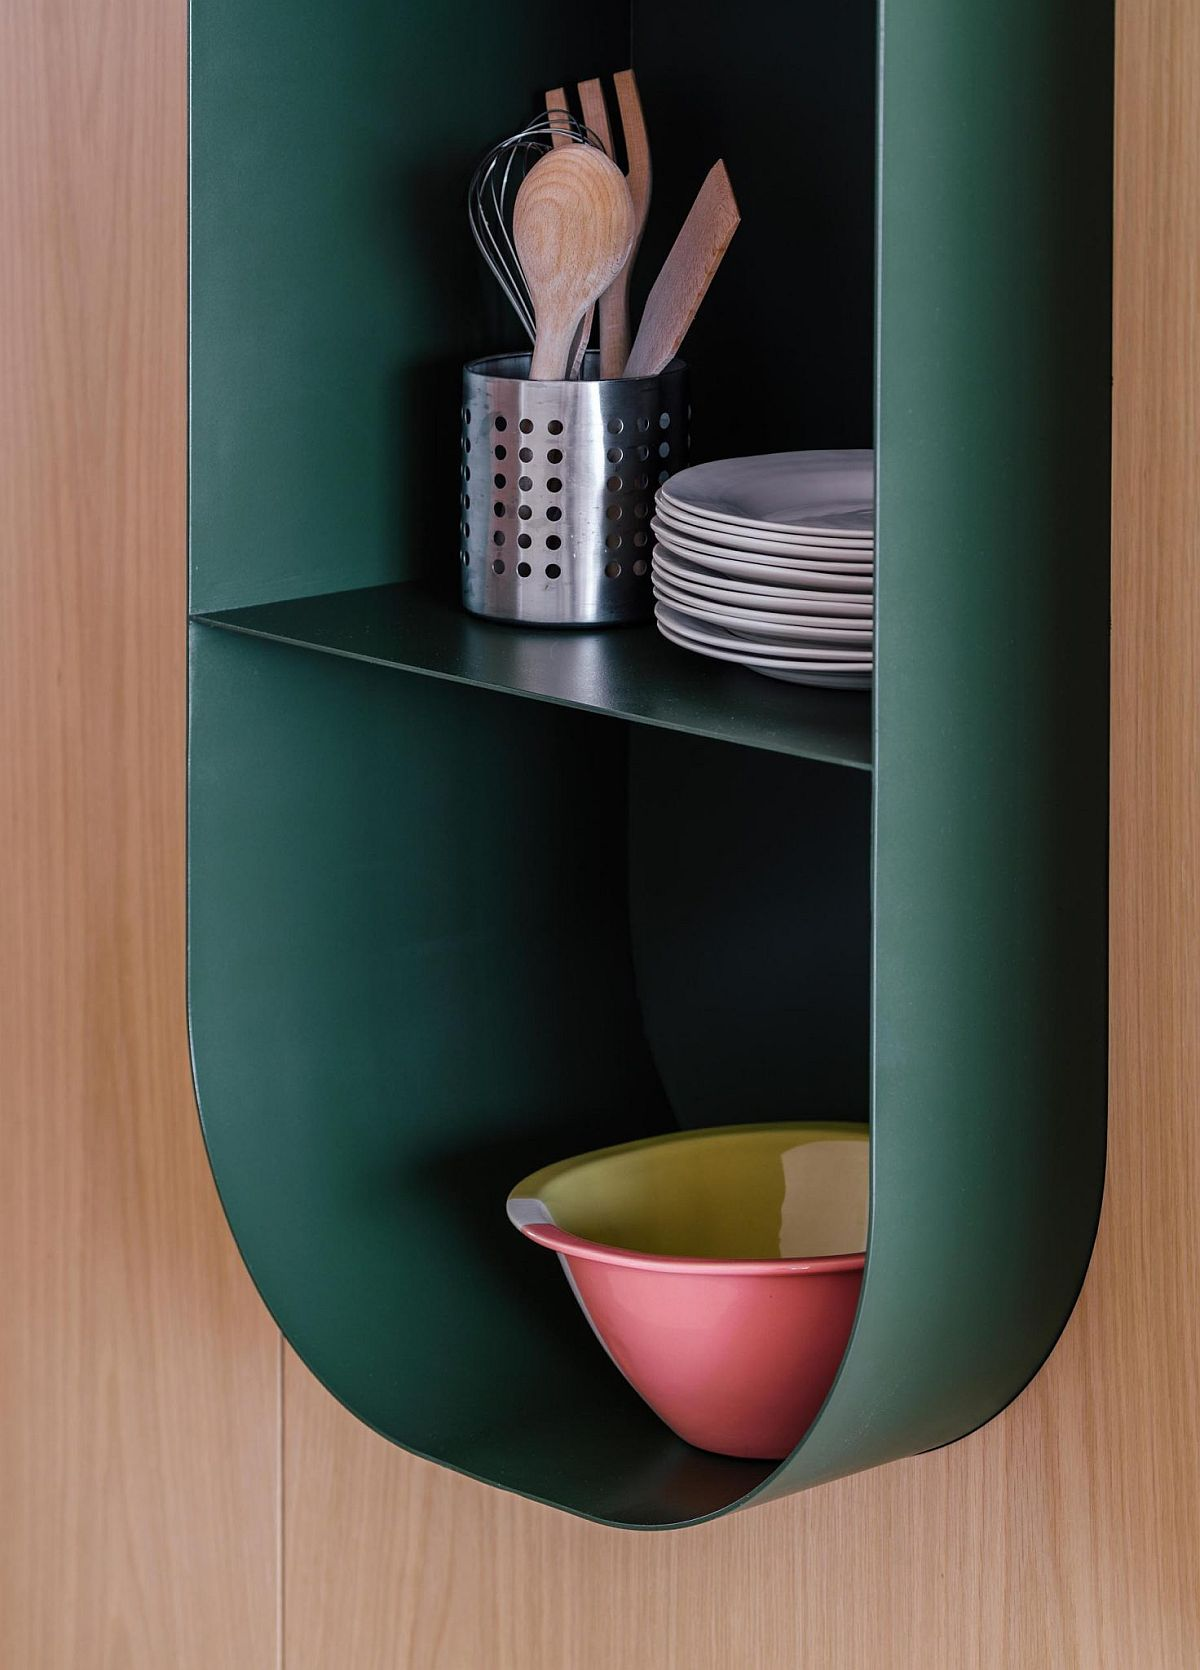 Closer look at the smart, modular bookshelf designed for Spanish home